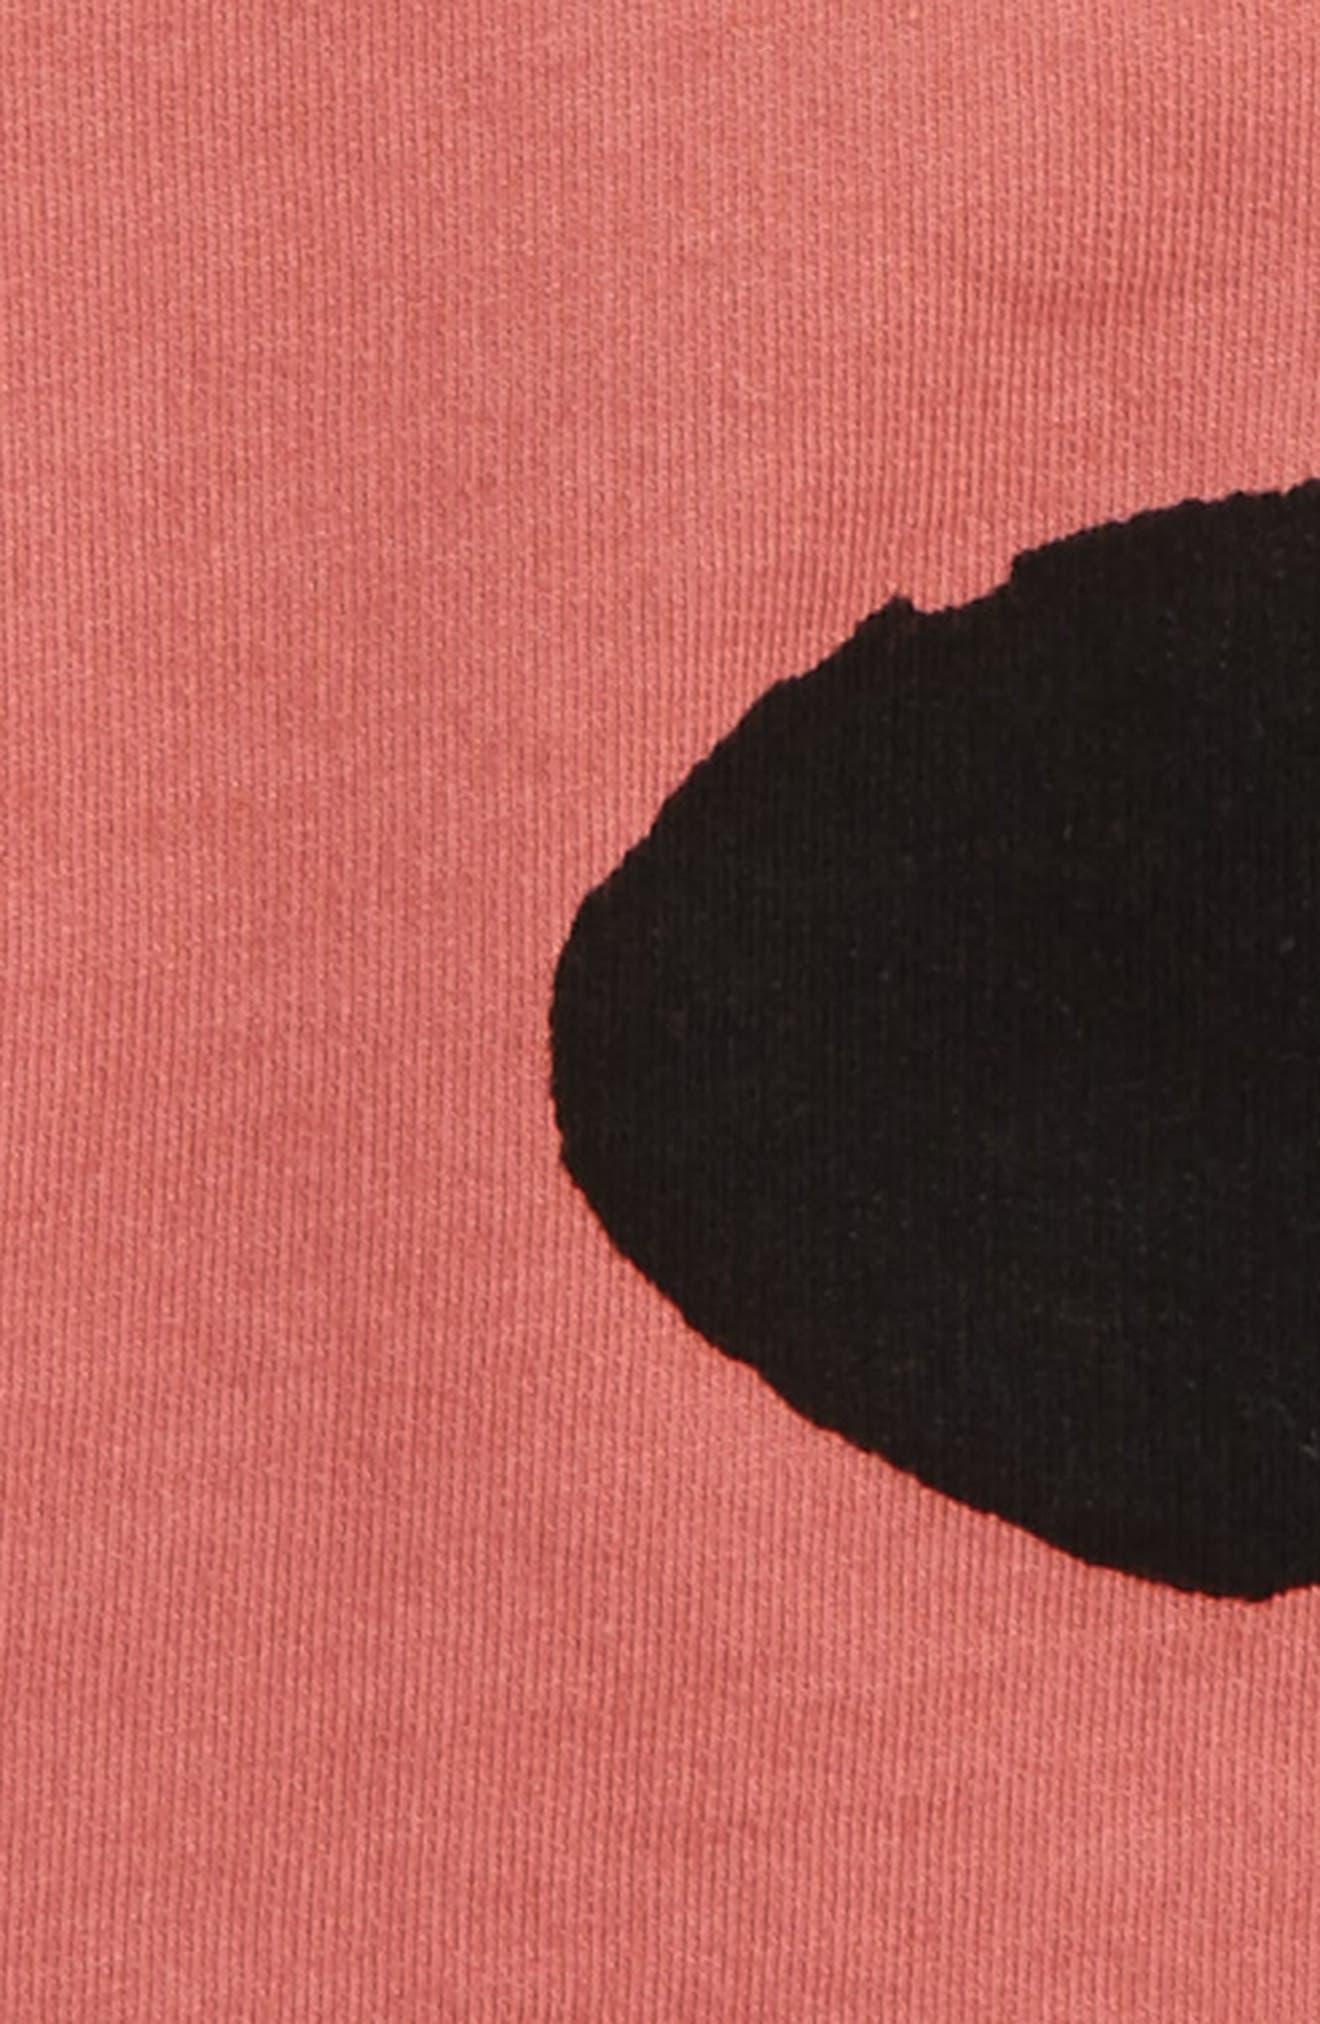 Dot Sweatshirt,                             Alternate thumbnail 2, color,                             600